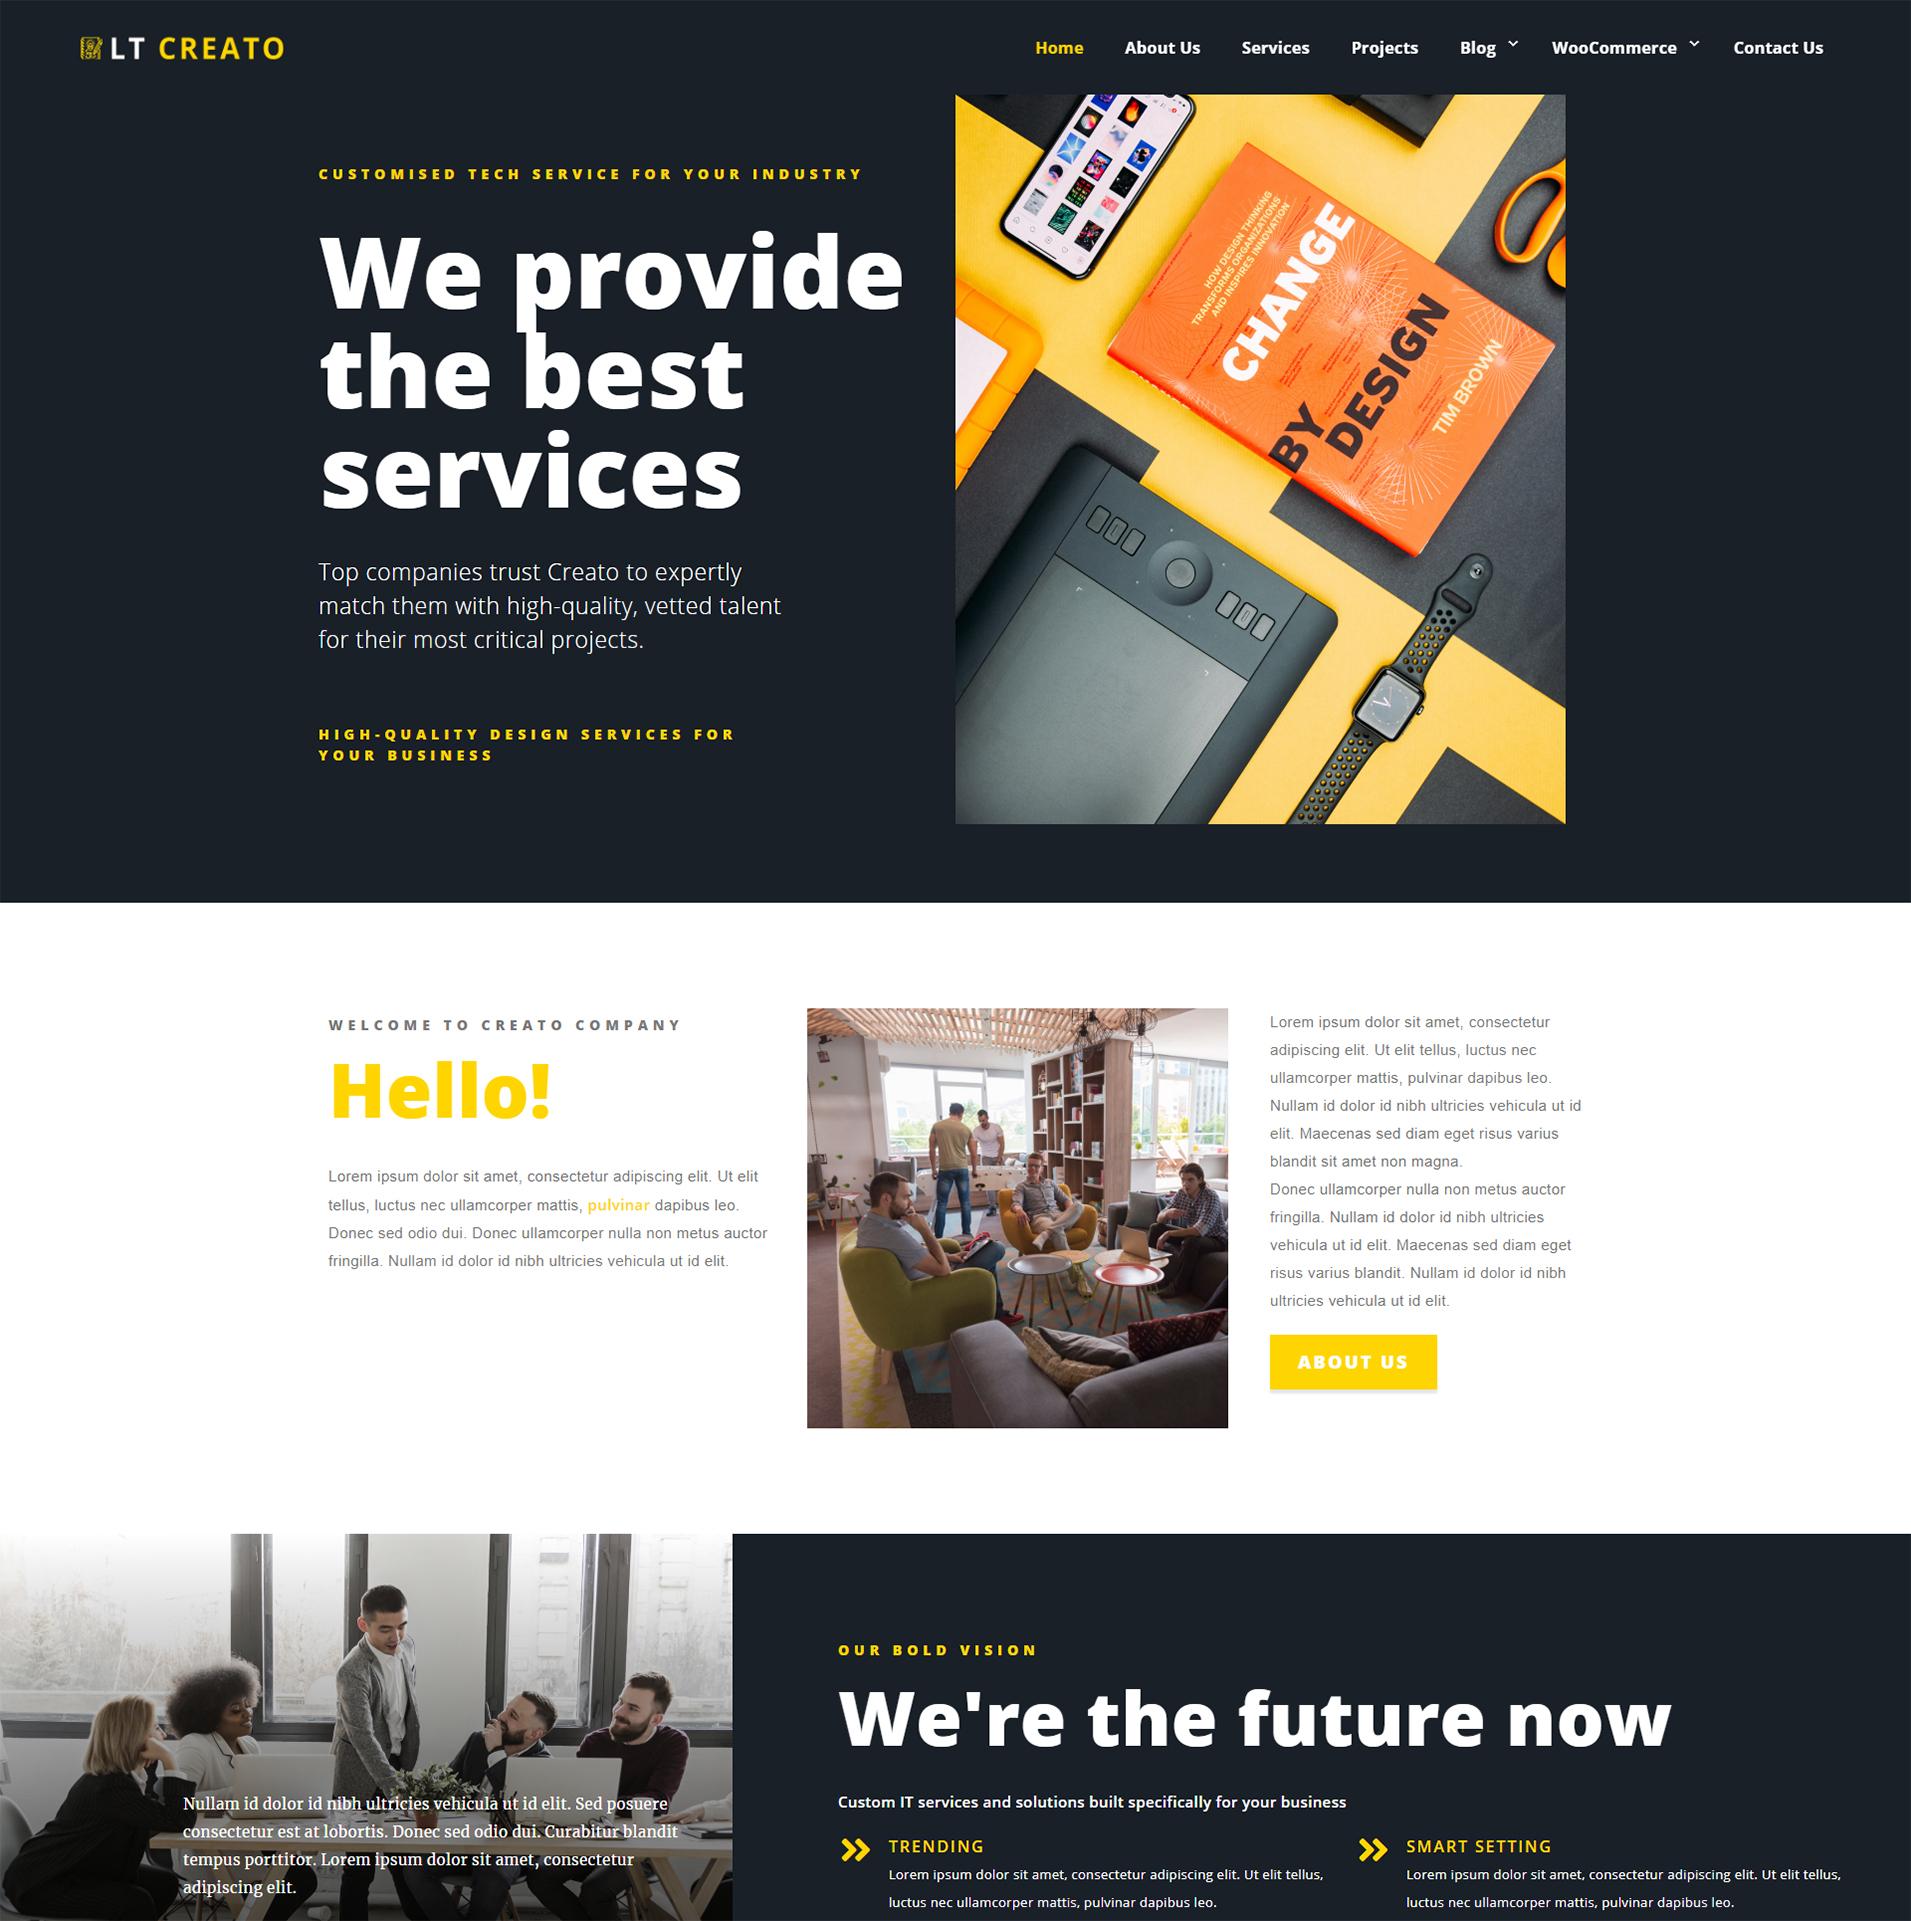 lt-creato-free-responsive-wordpress-theme